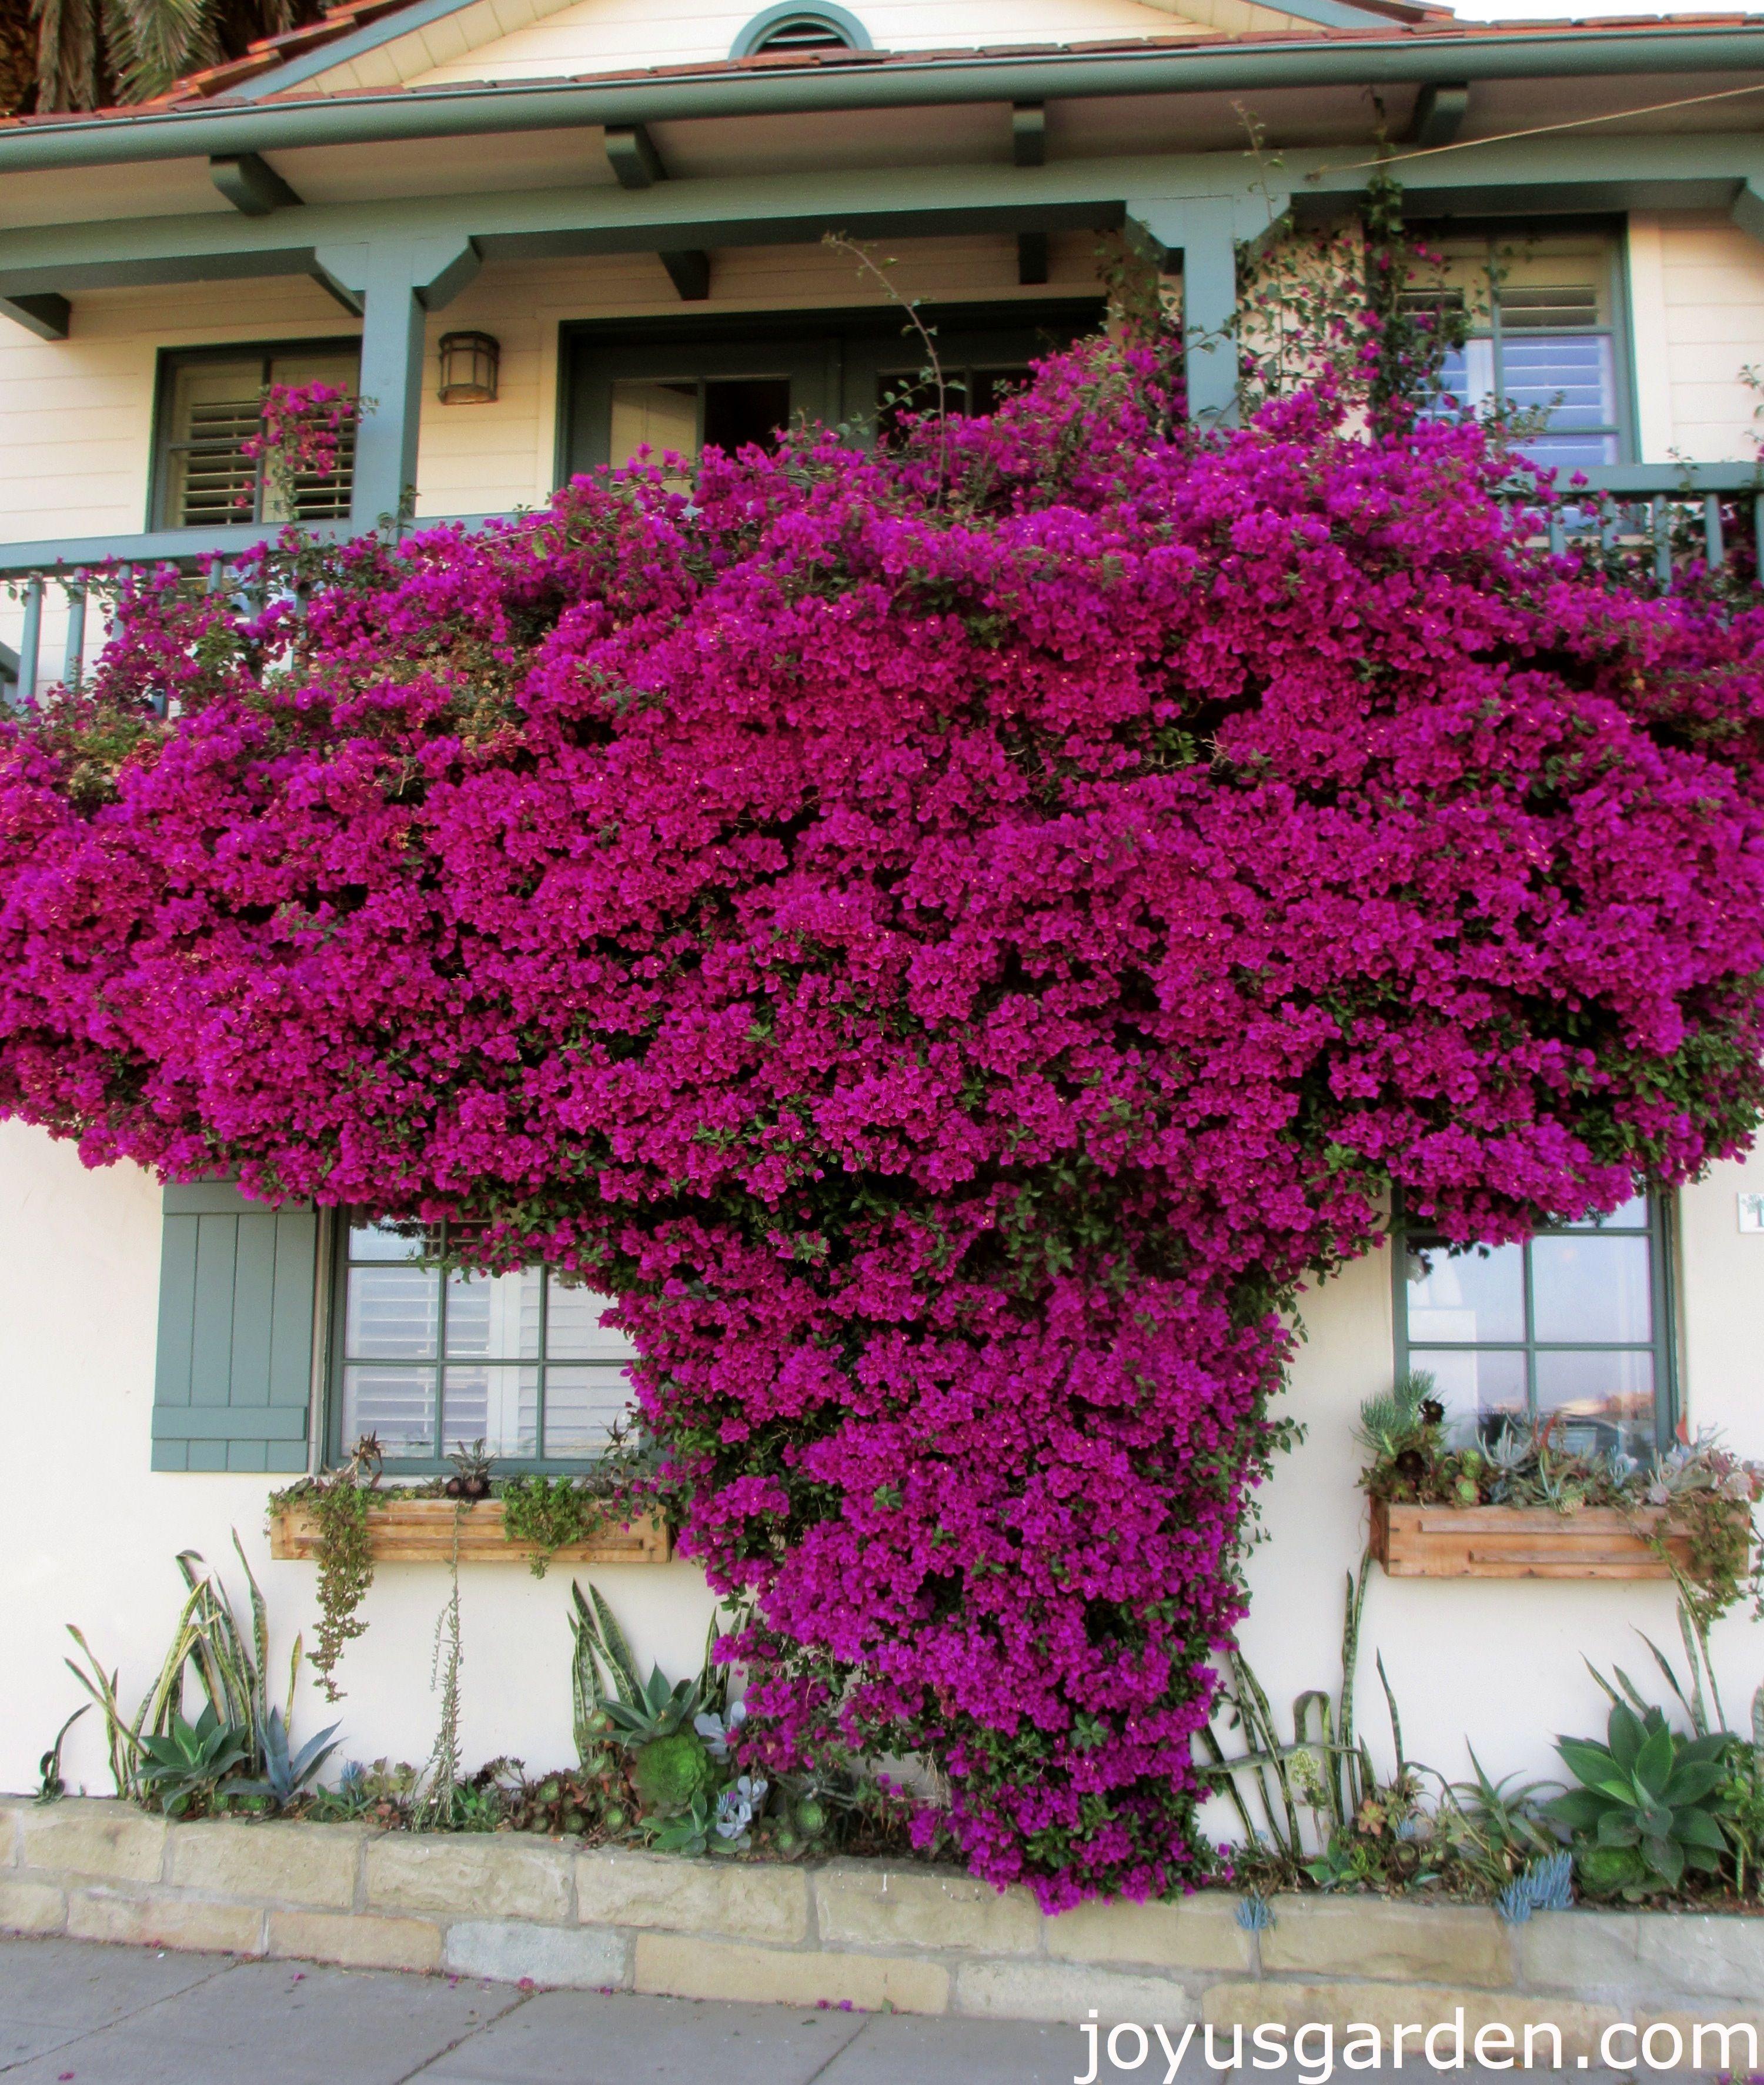 Bougainville Fleur dedans bougainvillea - talk about a splash of color! | bougainvillea